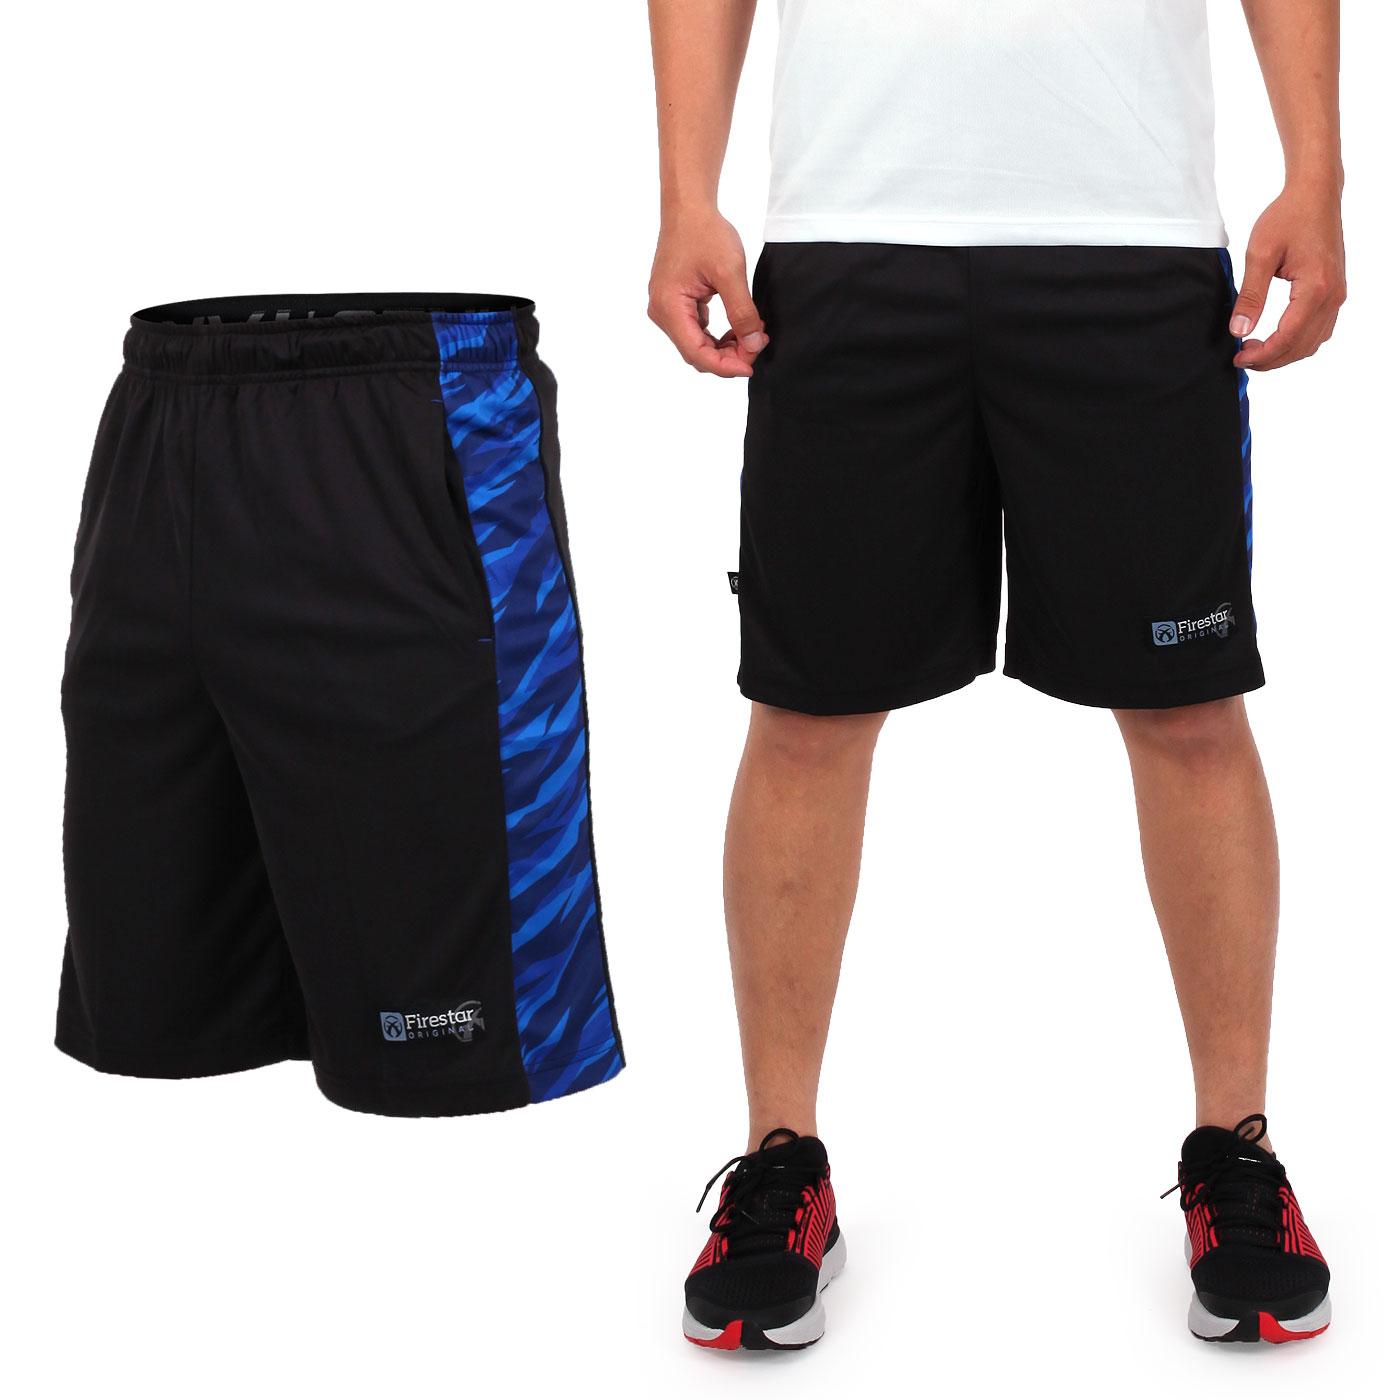 FIRESTAR 籃球褲 B7606-40 - 黑寶藍